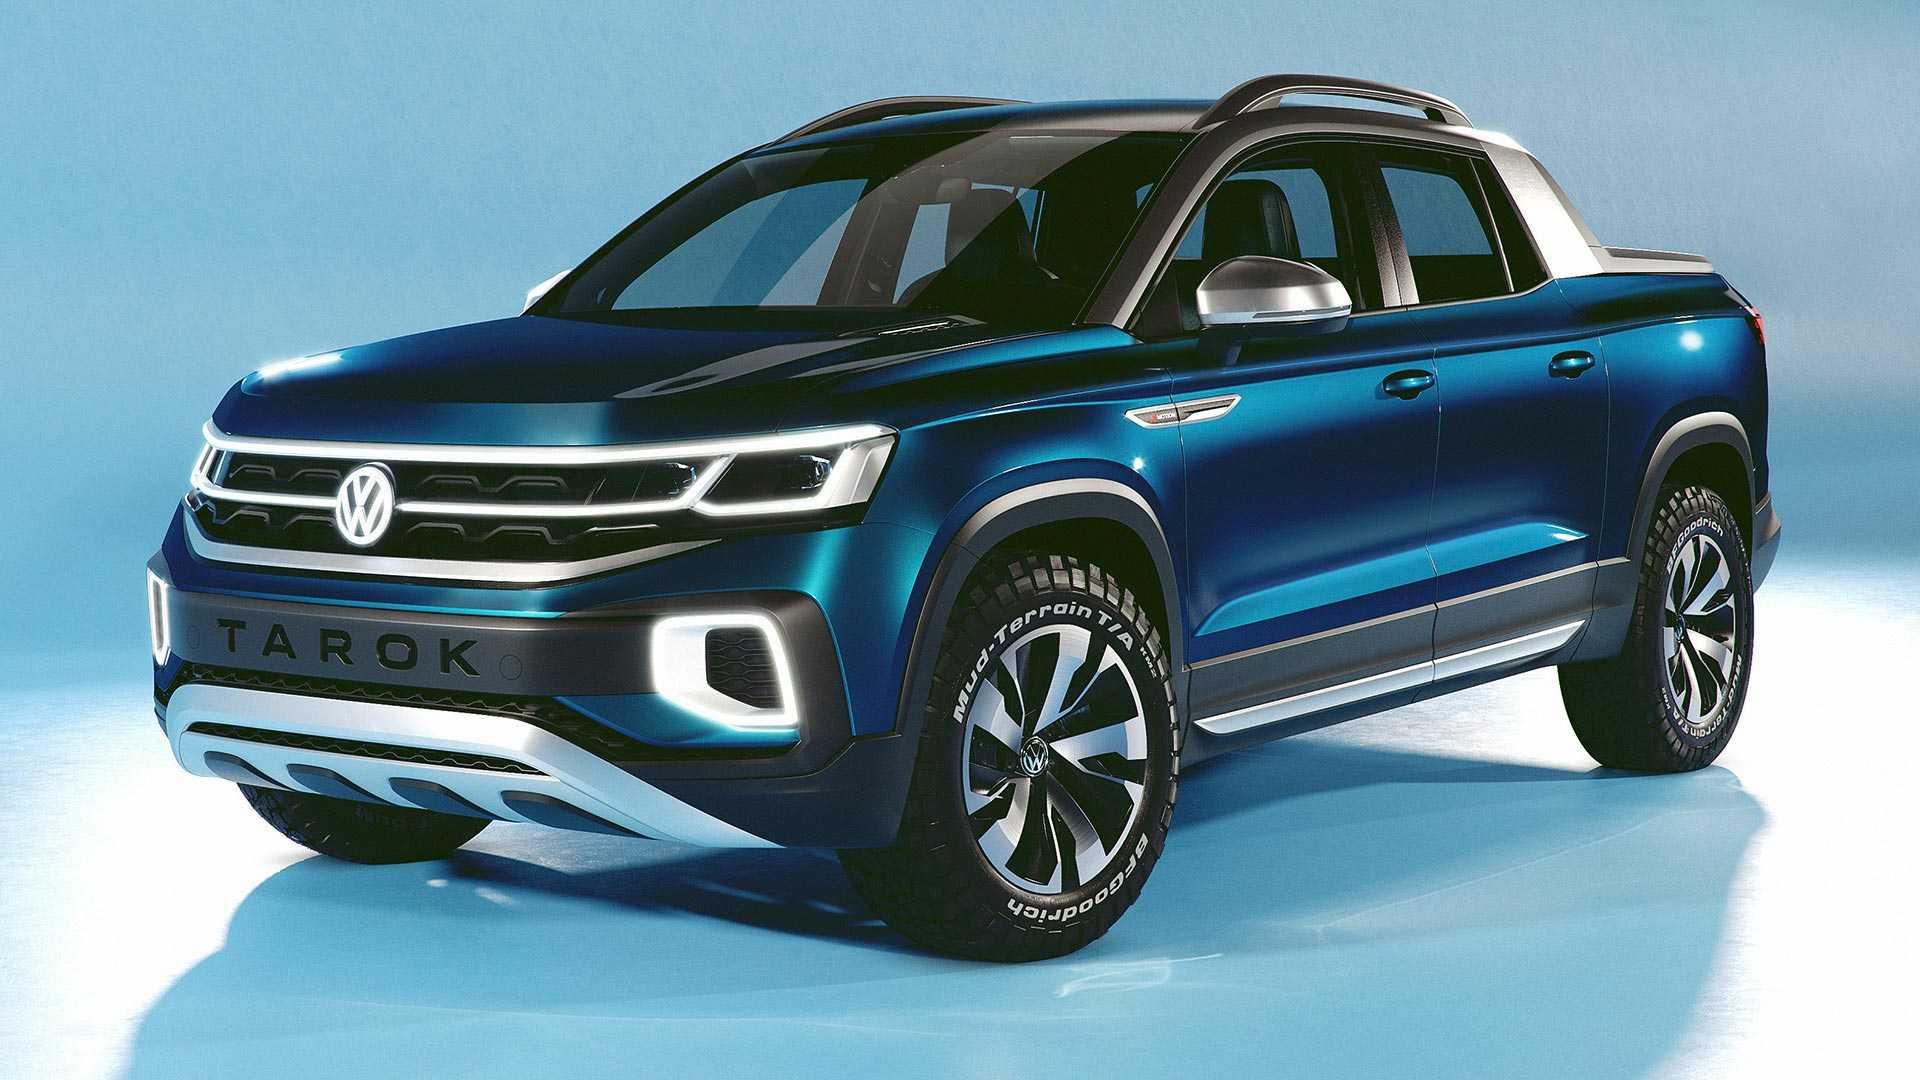 volkswagen-tarok-concept-2 Conceptul VW Tarok - pick-up compact pentru productie